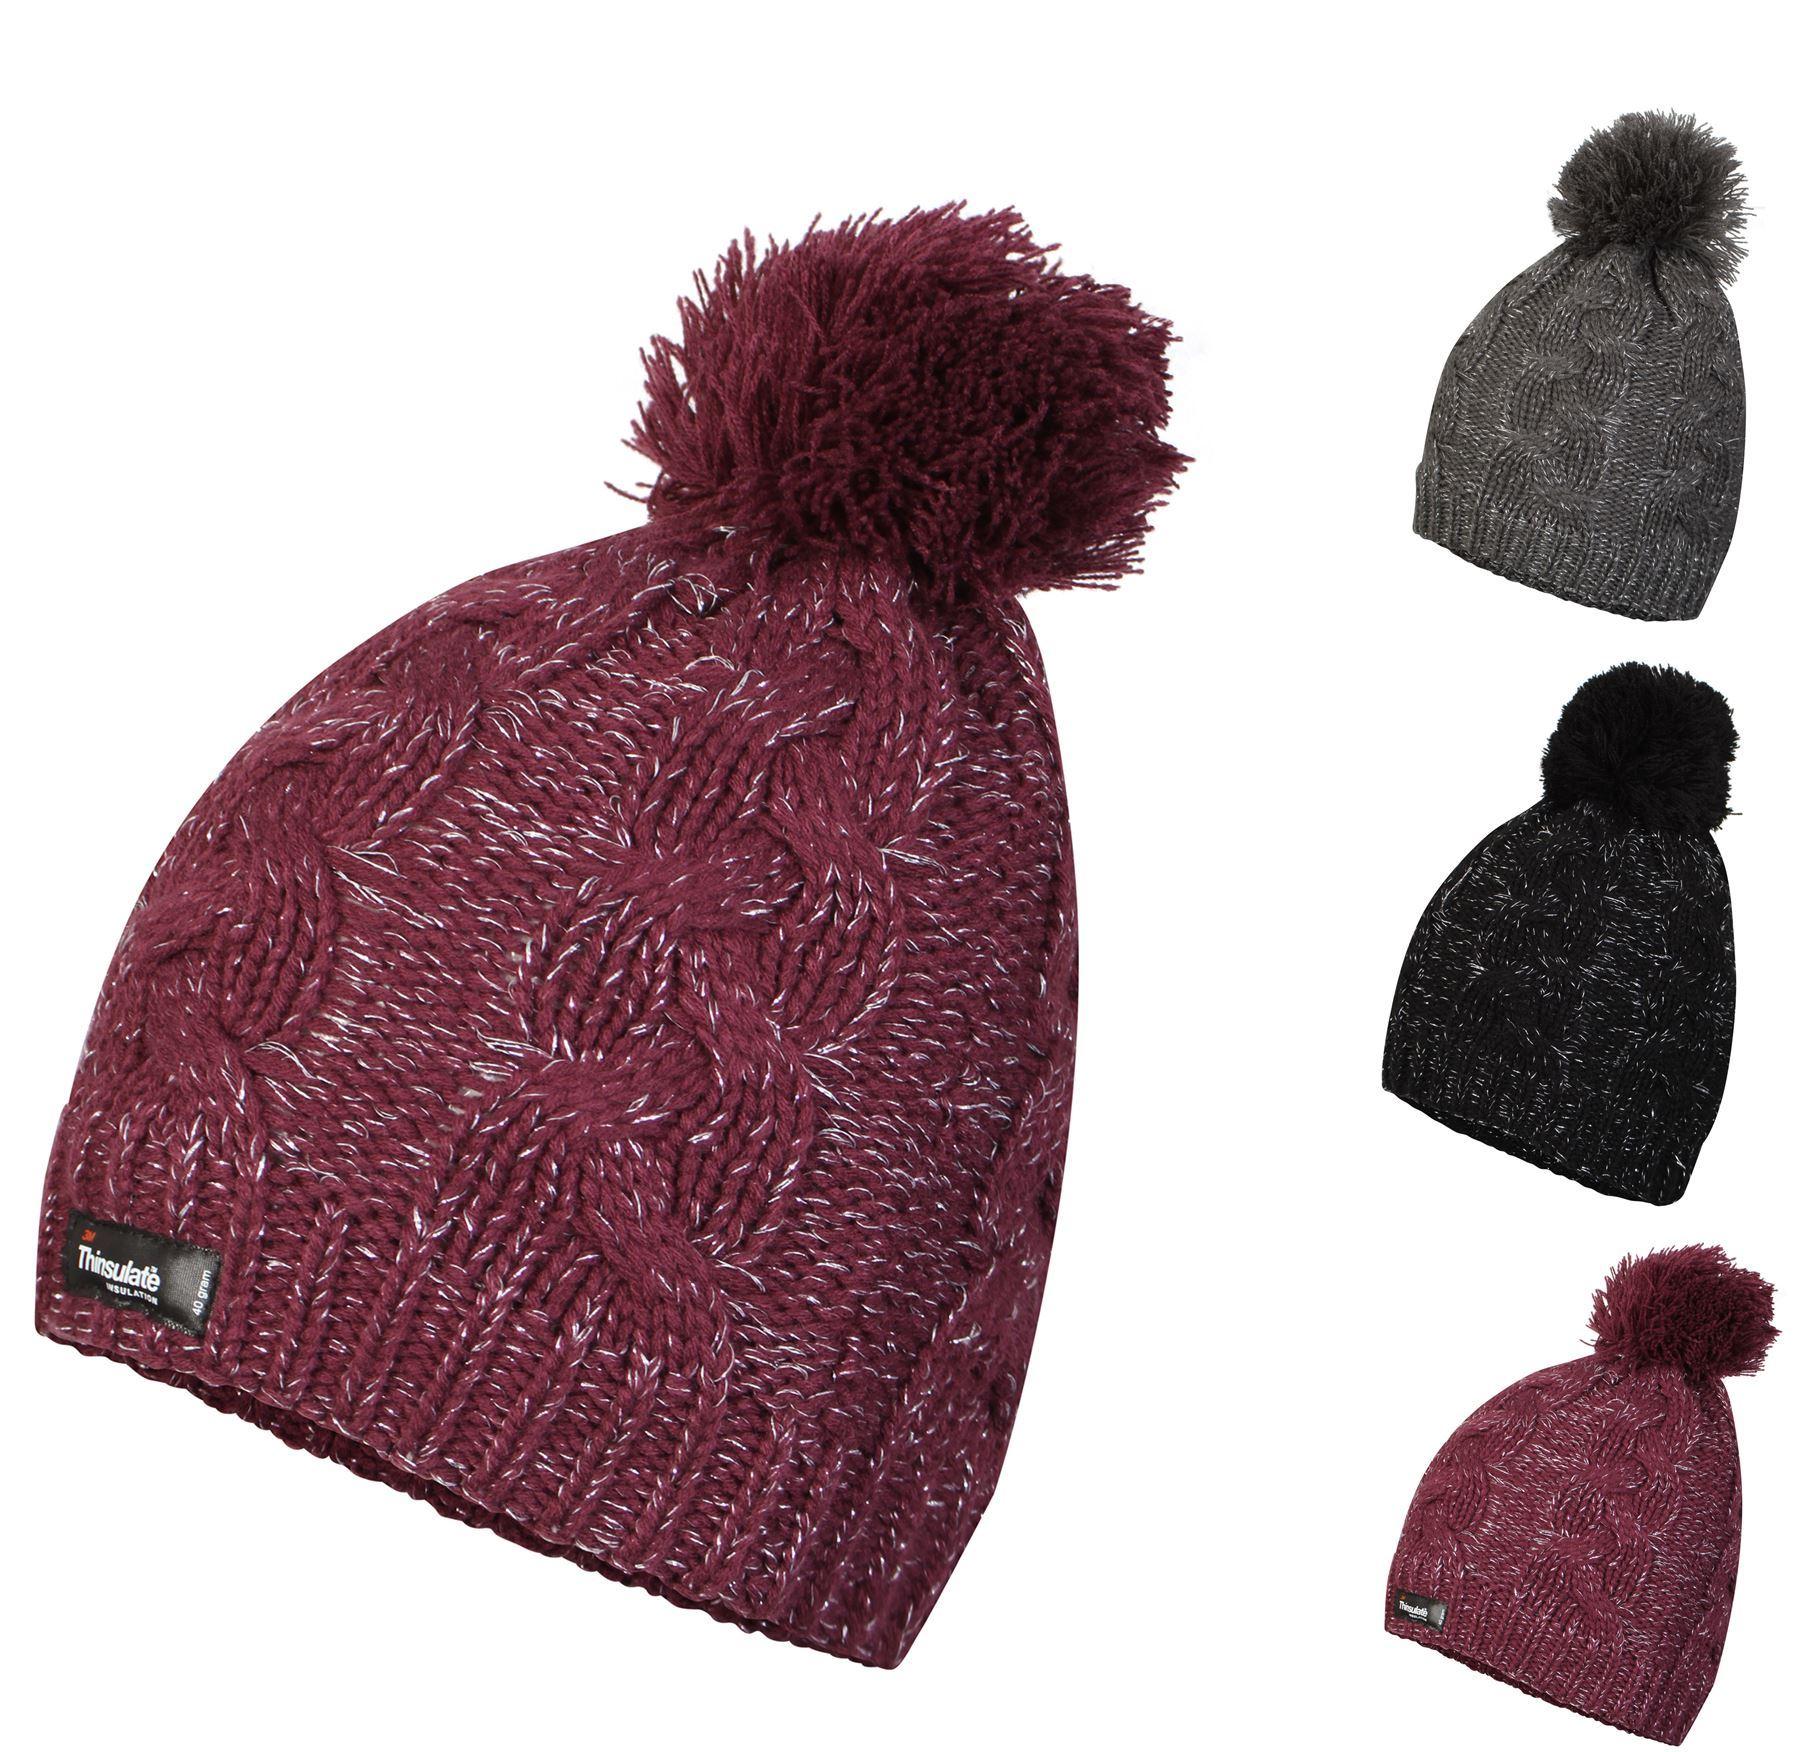 46907cf64 Details about Women's Waterproof Thinsulate Beanie Hat Lurex Bobble Hats,  L12